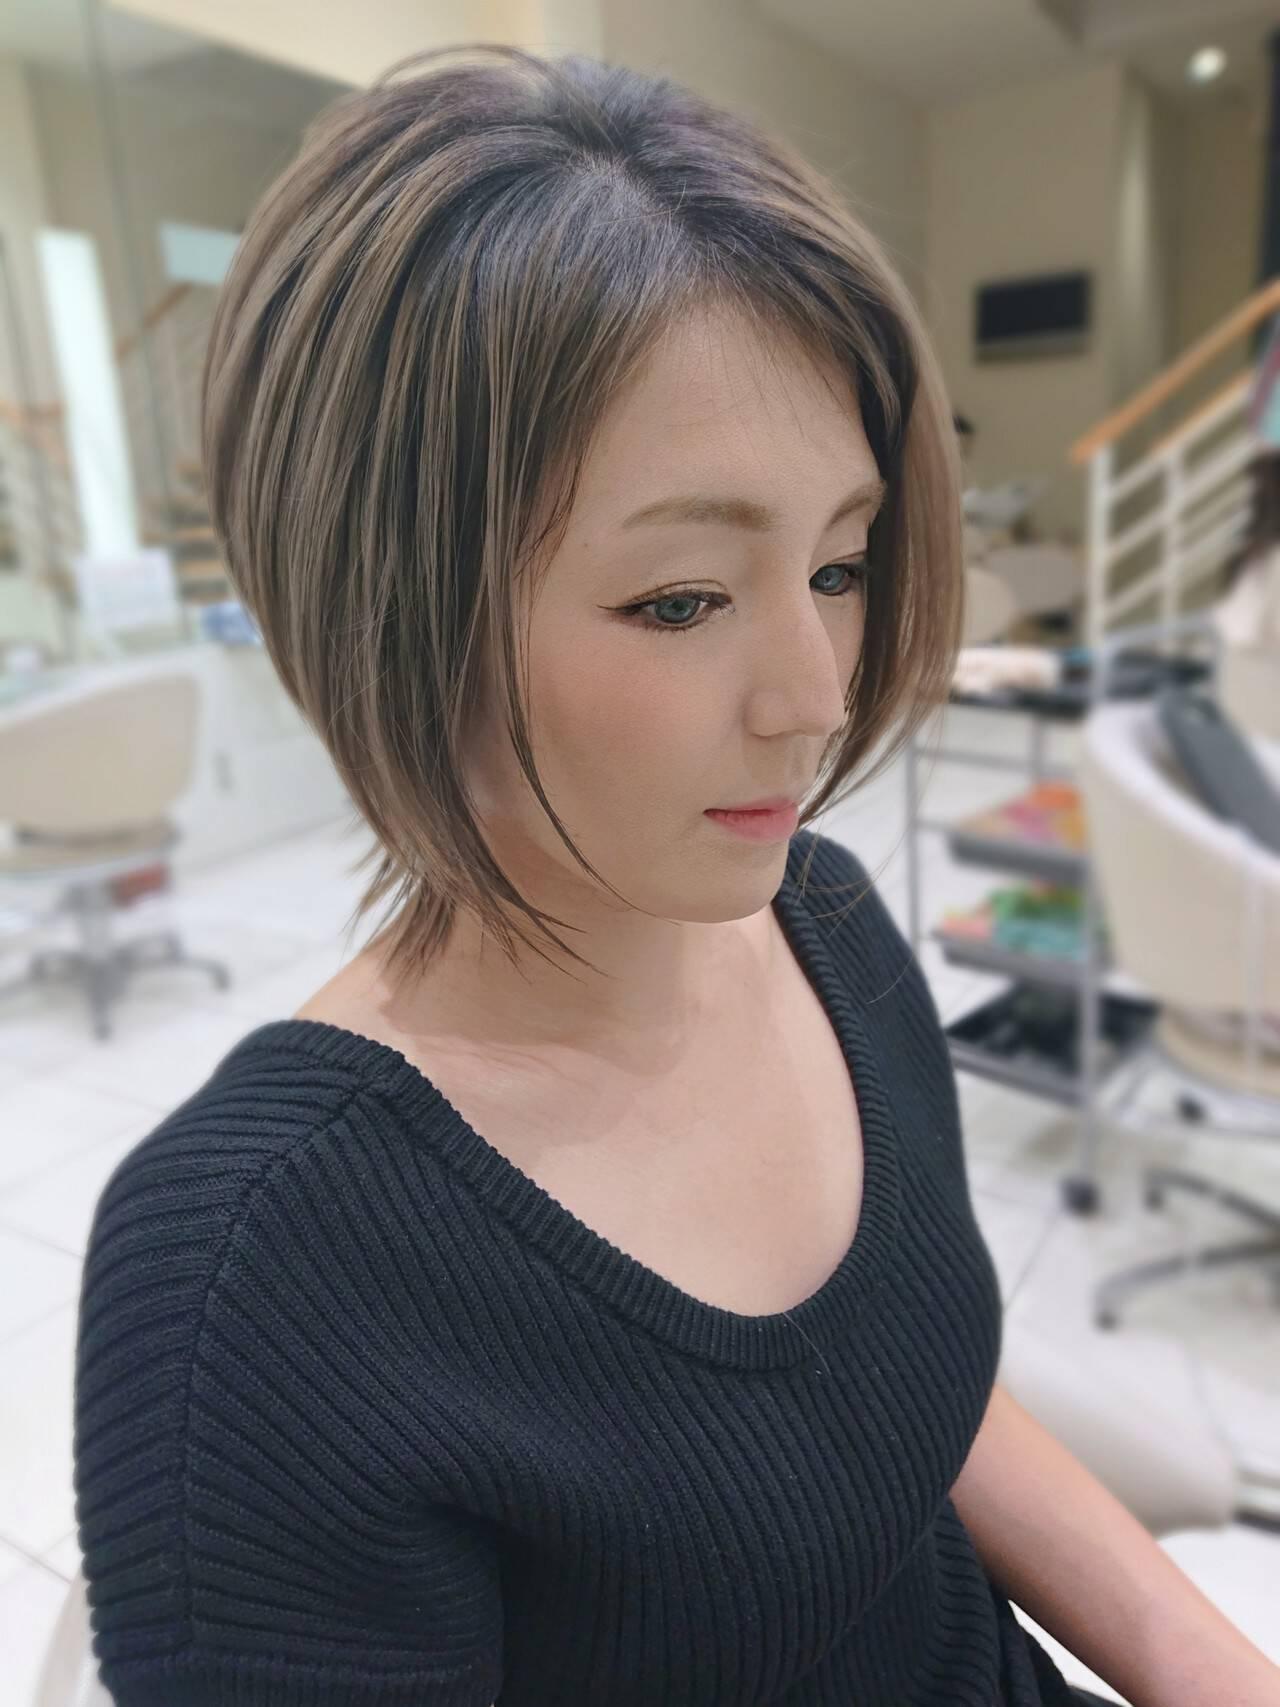 3Dハイライト ショートボブ フェミニン くびれカールヘアスタイルや髪型の写真・画像